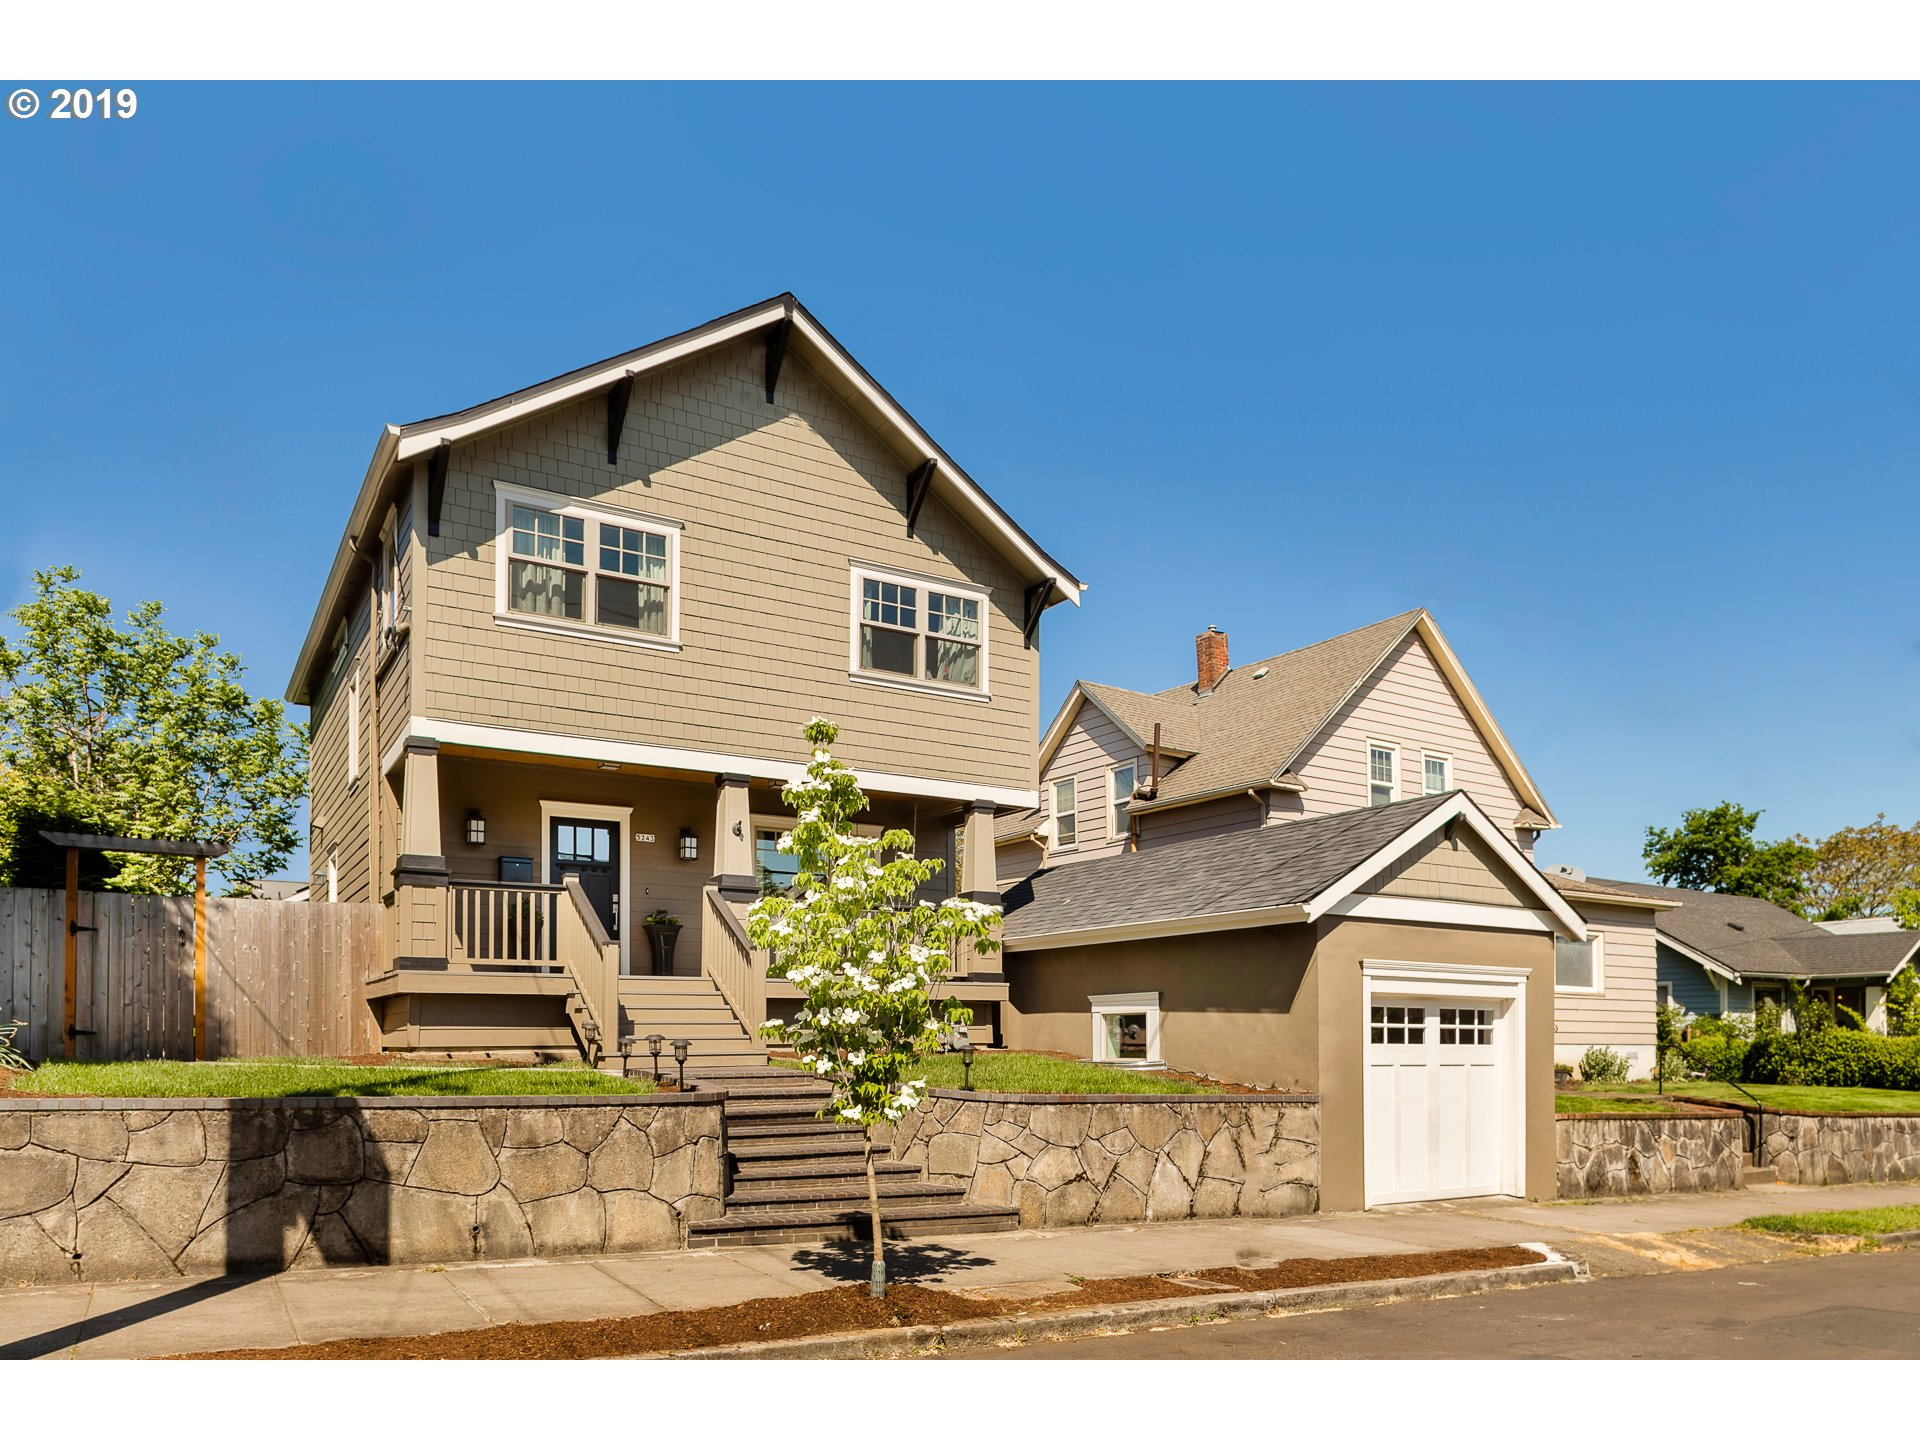 5243 NE 16TH AVE, Portland OR 97211